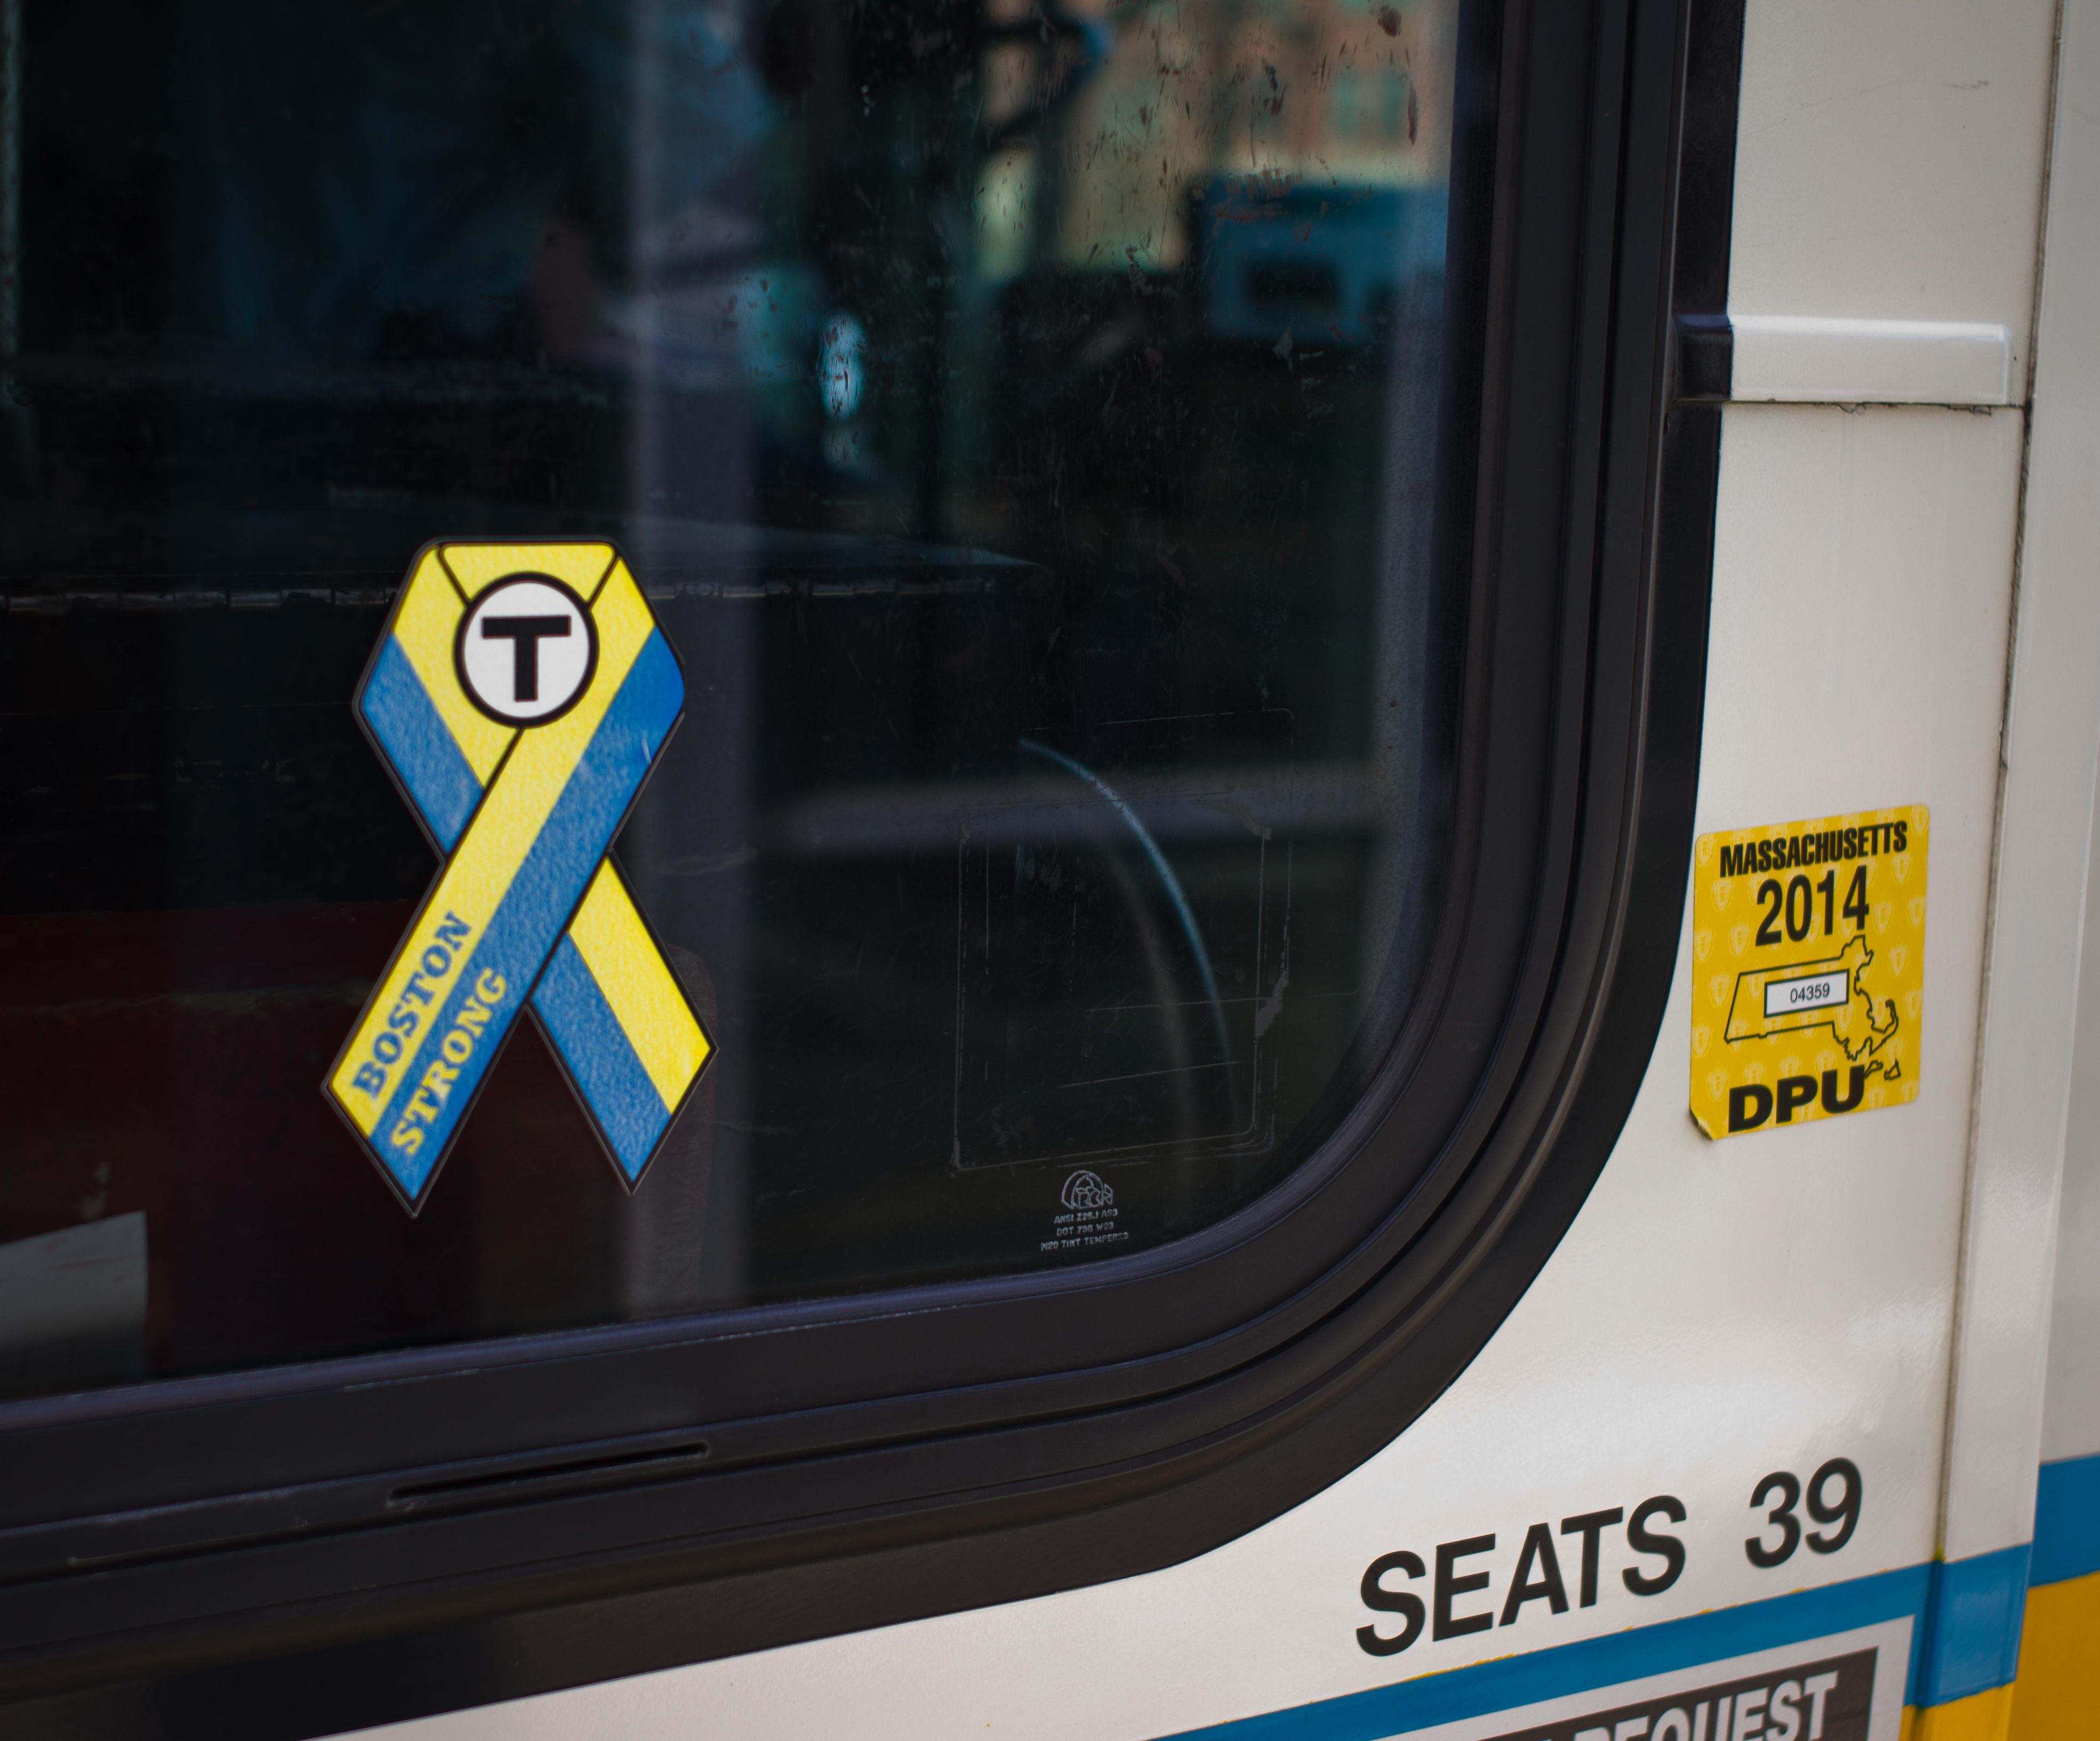 A shot of a sticker on a local MBTA bus.